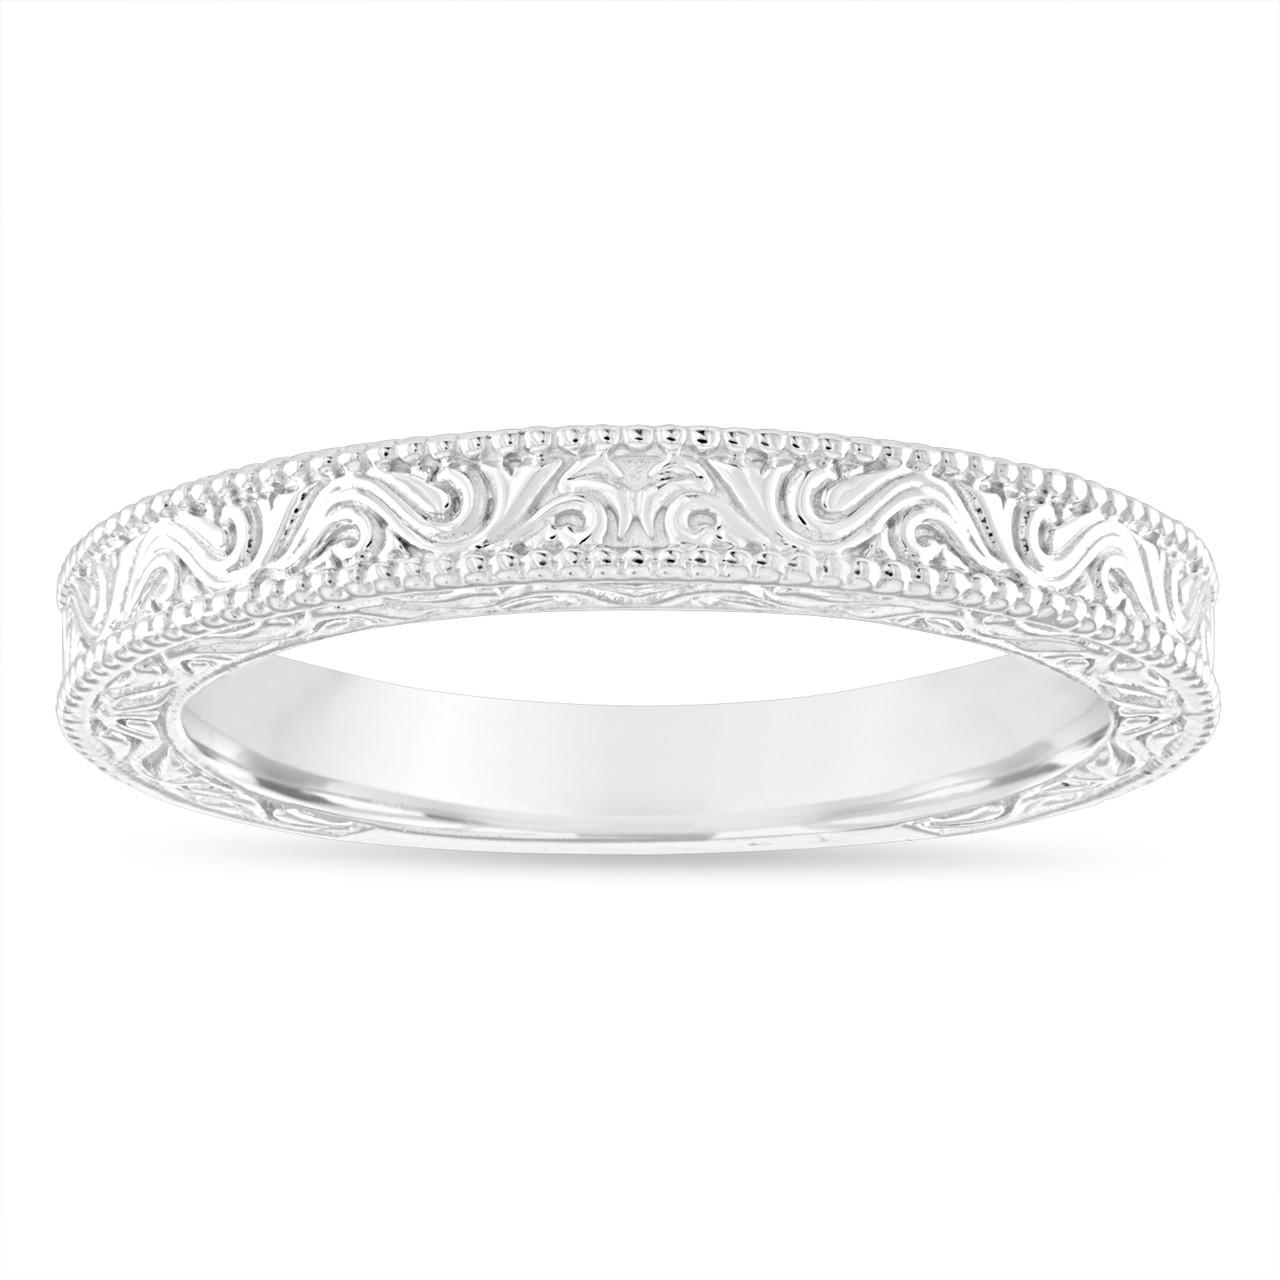 Filigree Wedding Band.Platinum Wedding Band Vintage Wedding Ring Filigree Anniversary Ring Antique Style Engraved Handmade